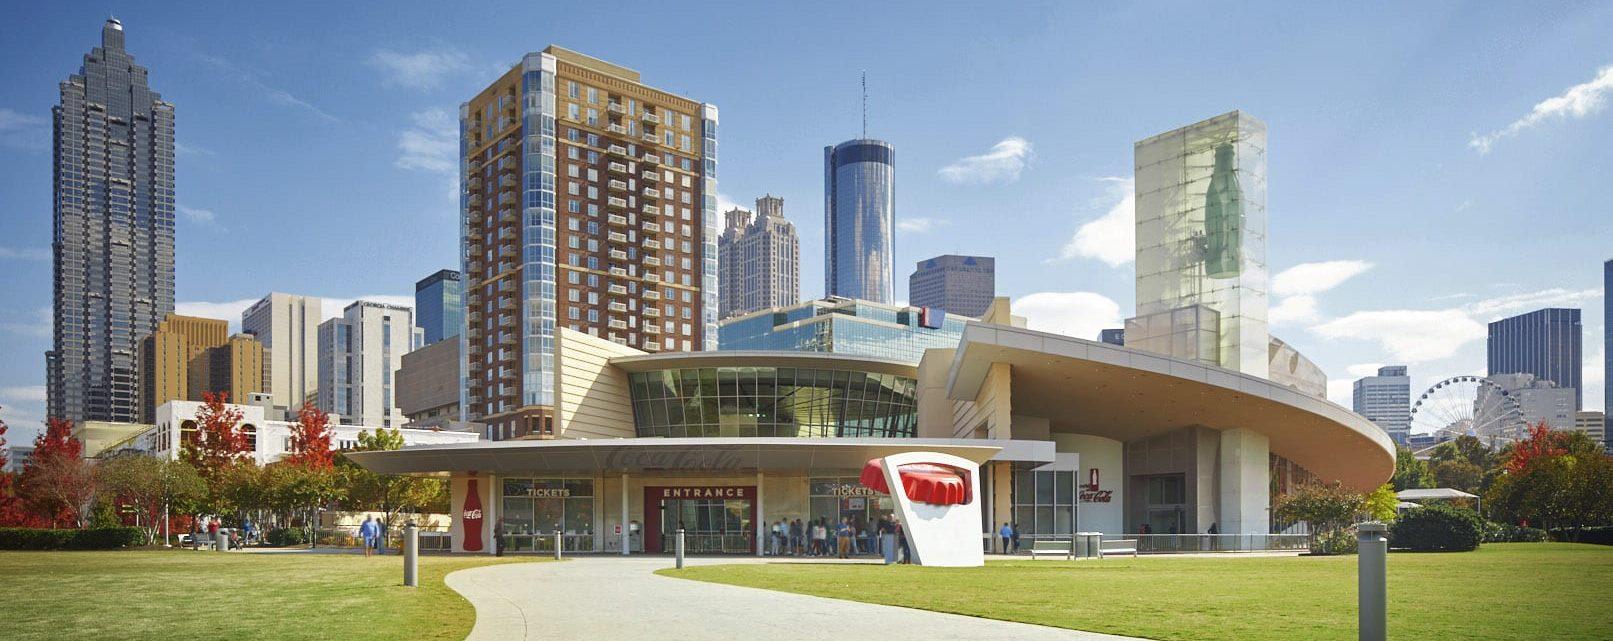 Popular Museums in Atlanta